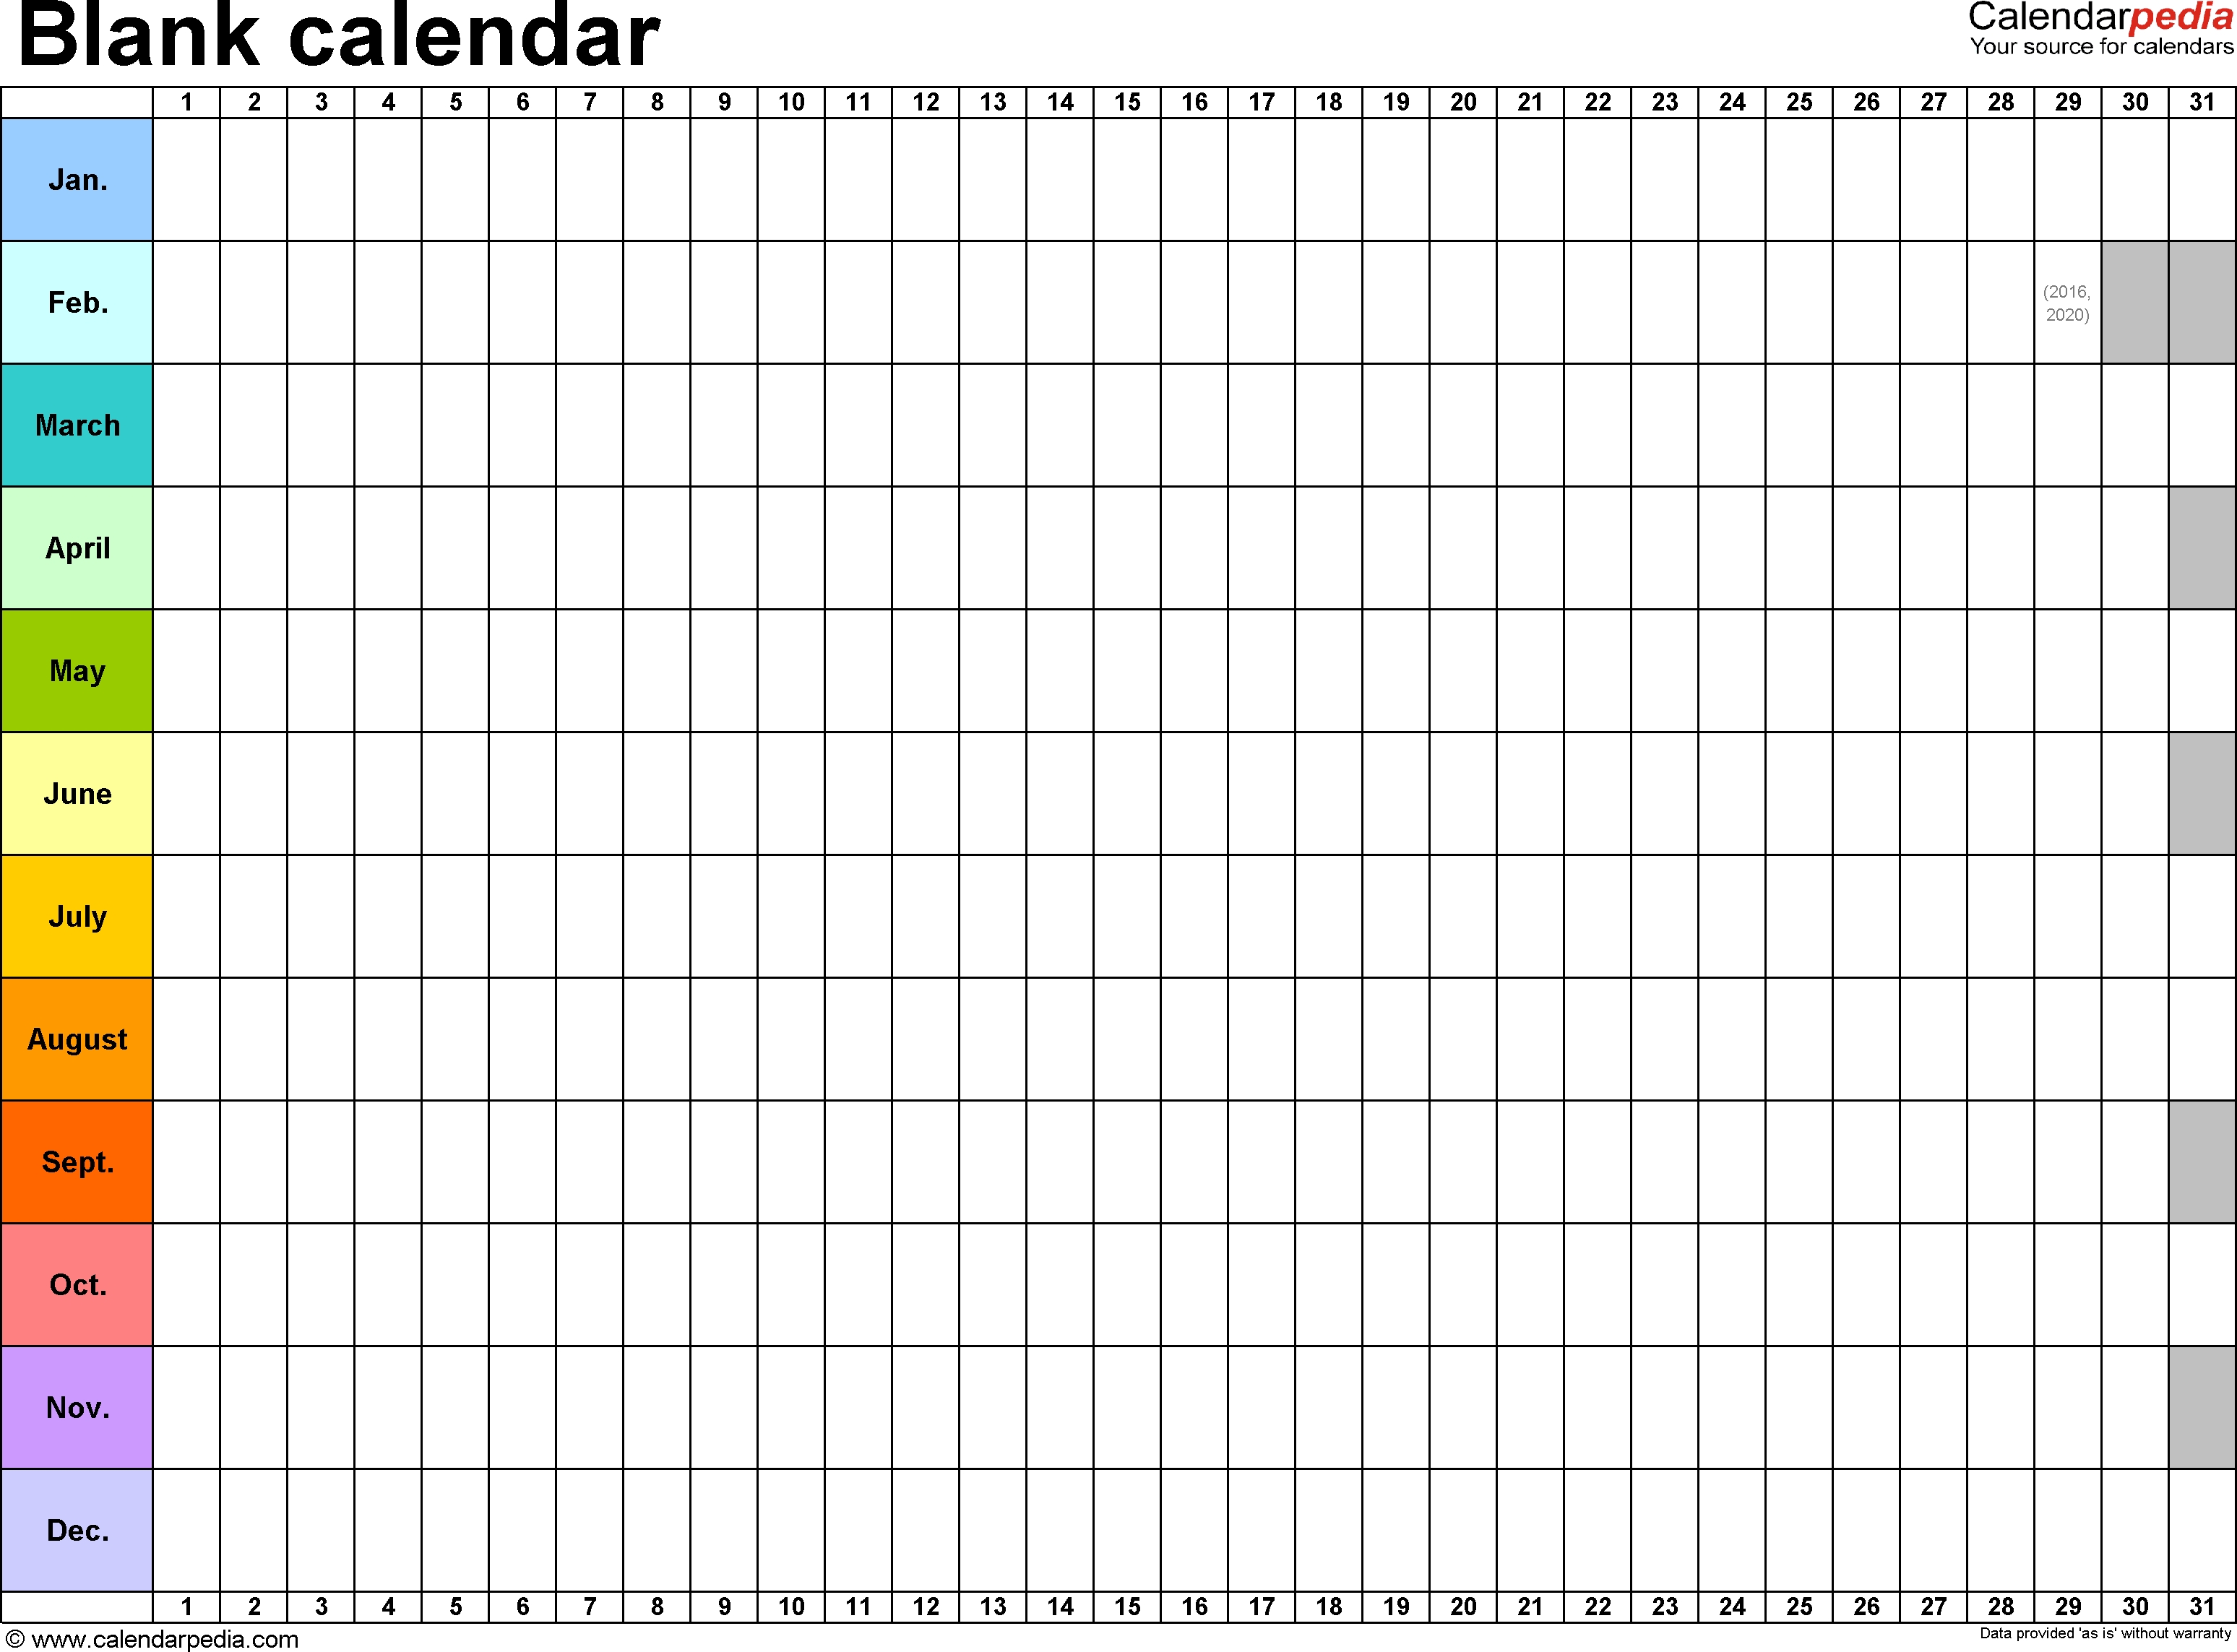 Blank Calendar - 9 Free Printable Microsoft Word Templates regarding Printable Calendar Template With Lines